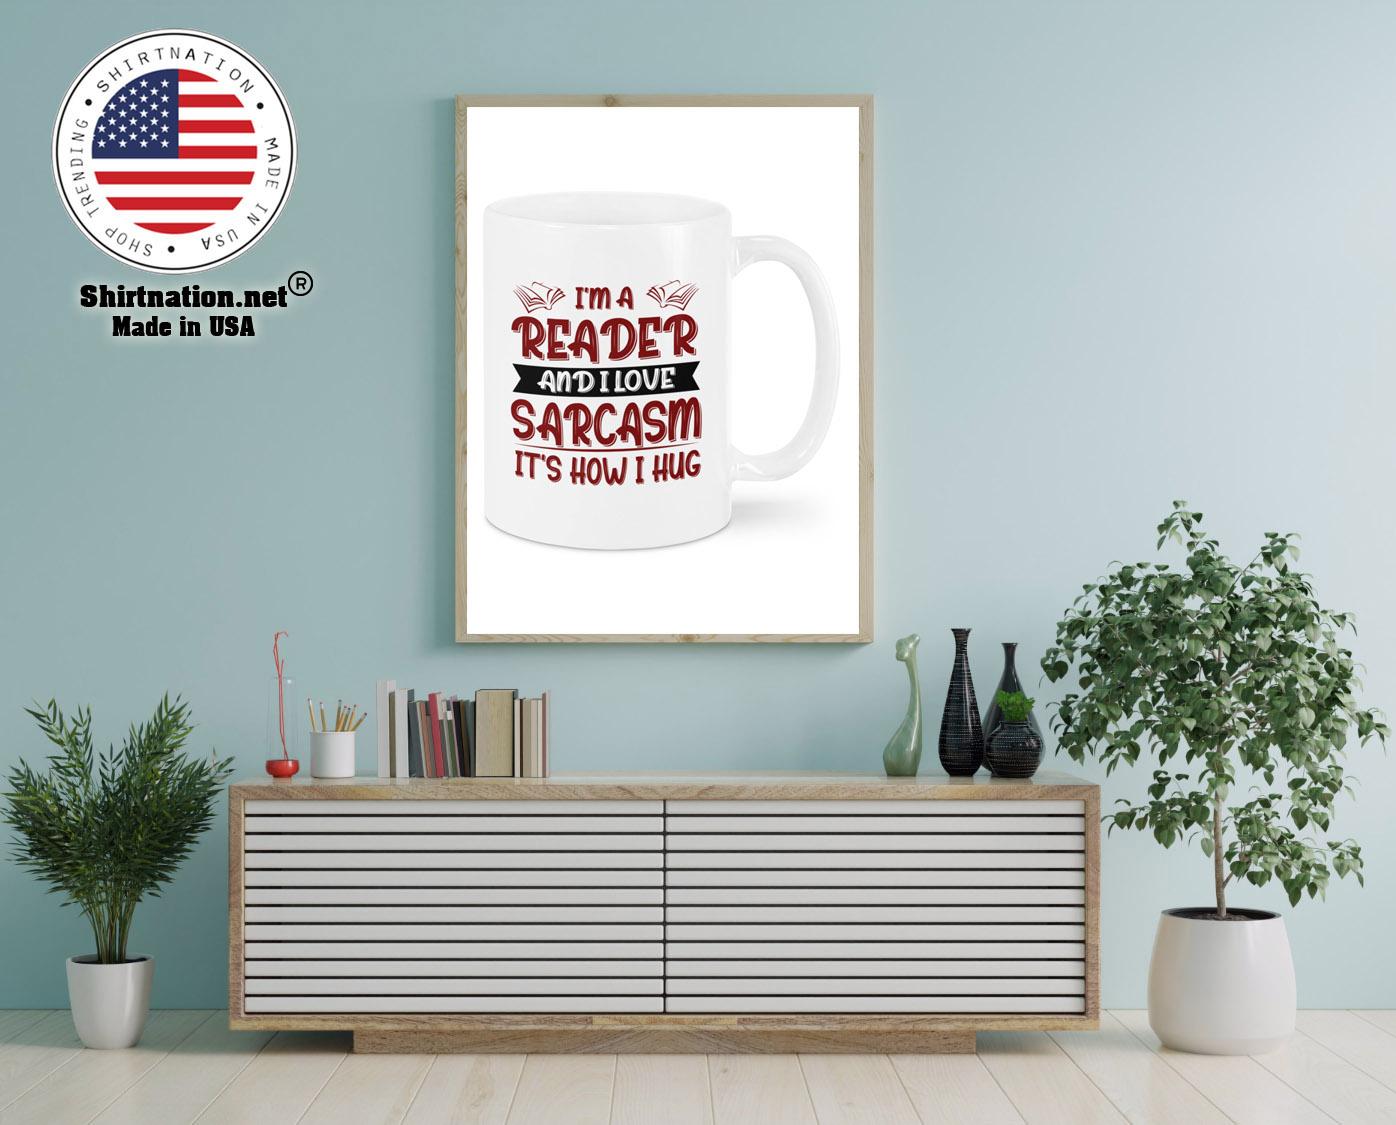 Im a reader and I love sarcasm mug 12